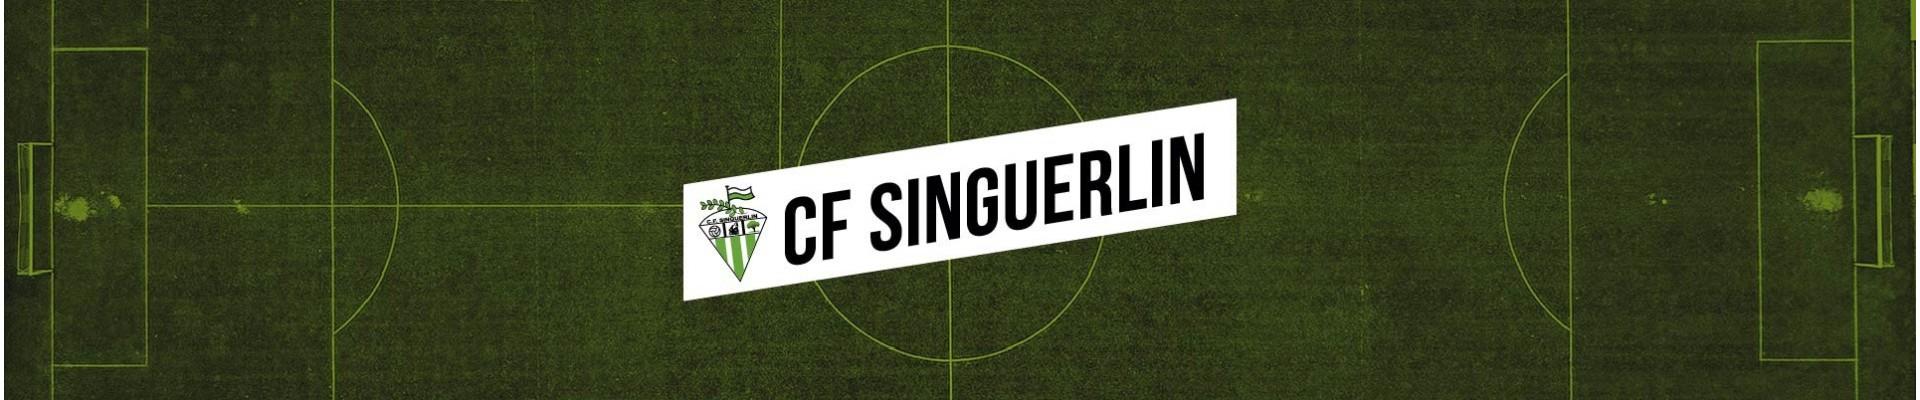 SINGUERLIN CF